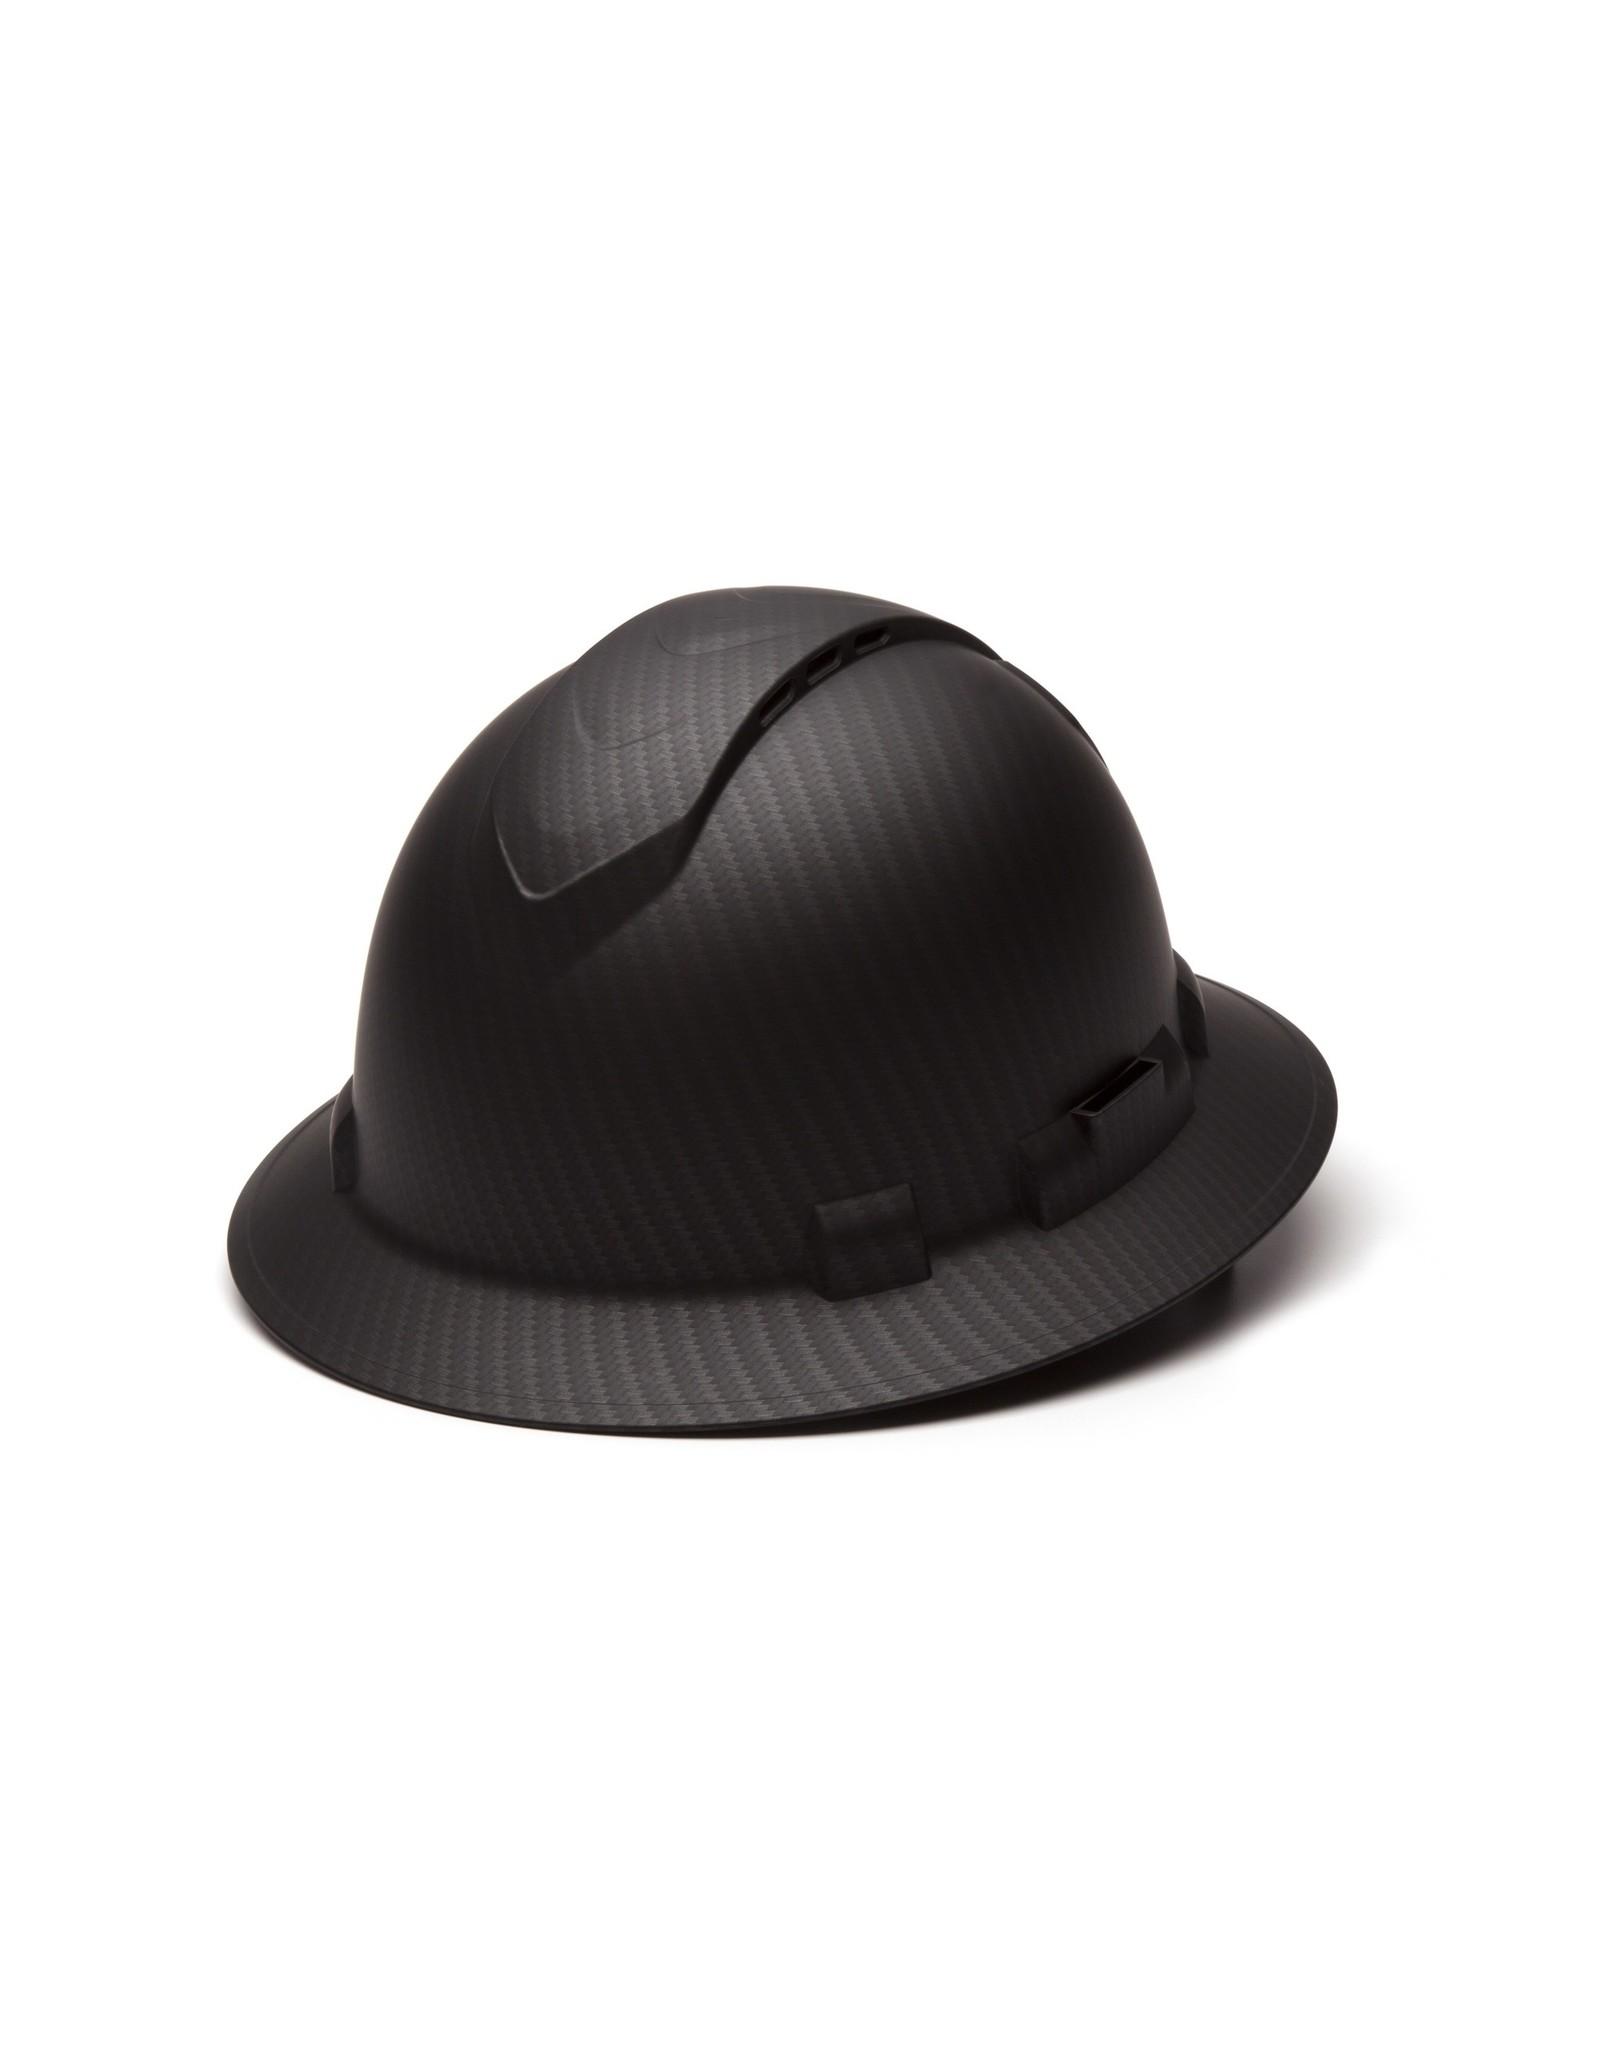 Pyramex Ridgeline Full Brim Hard Hat Carbon Fiber